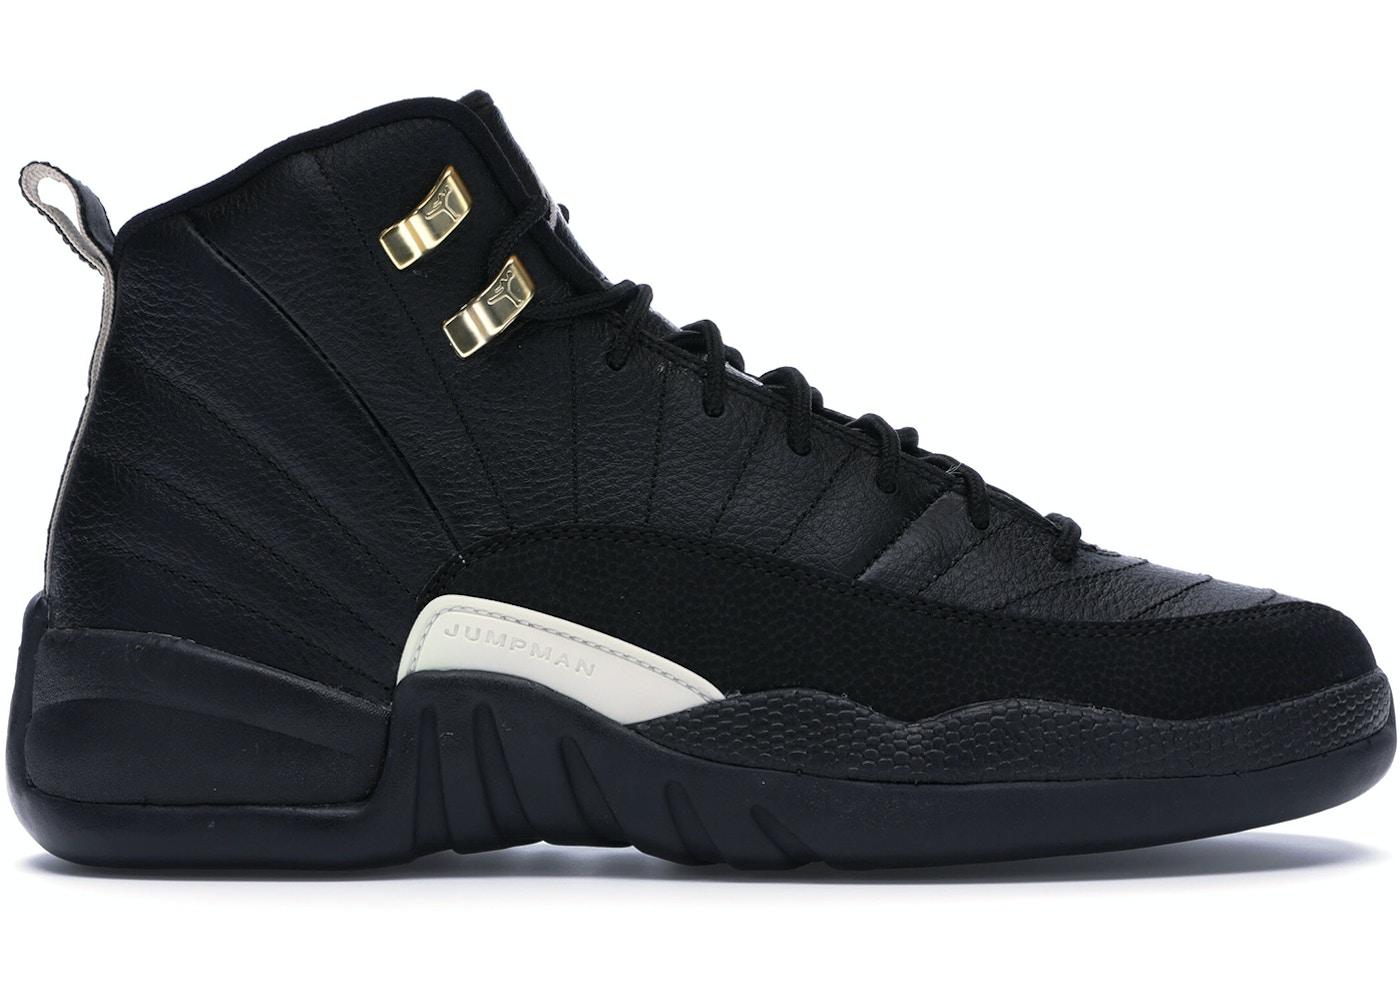 cheap for discount 192bf fb5c2 Buy Air Jordan 12 Shoes   Deadstock Sneakers